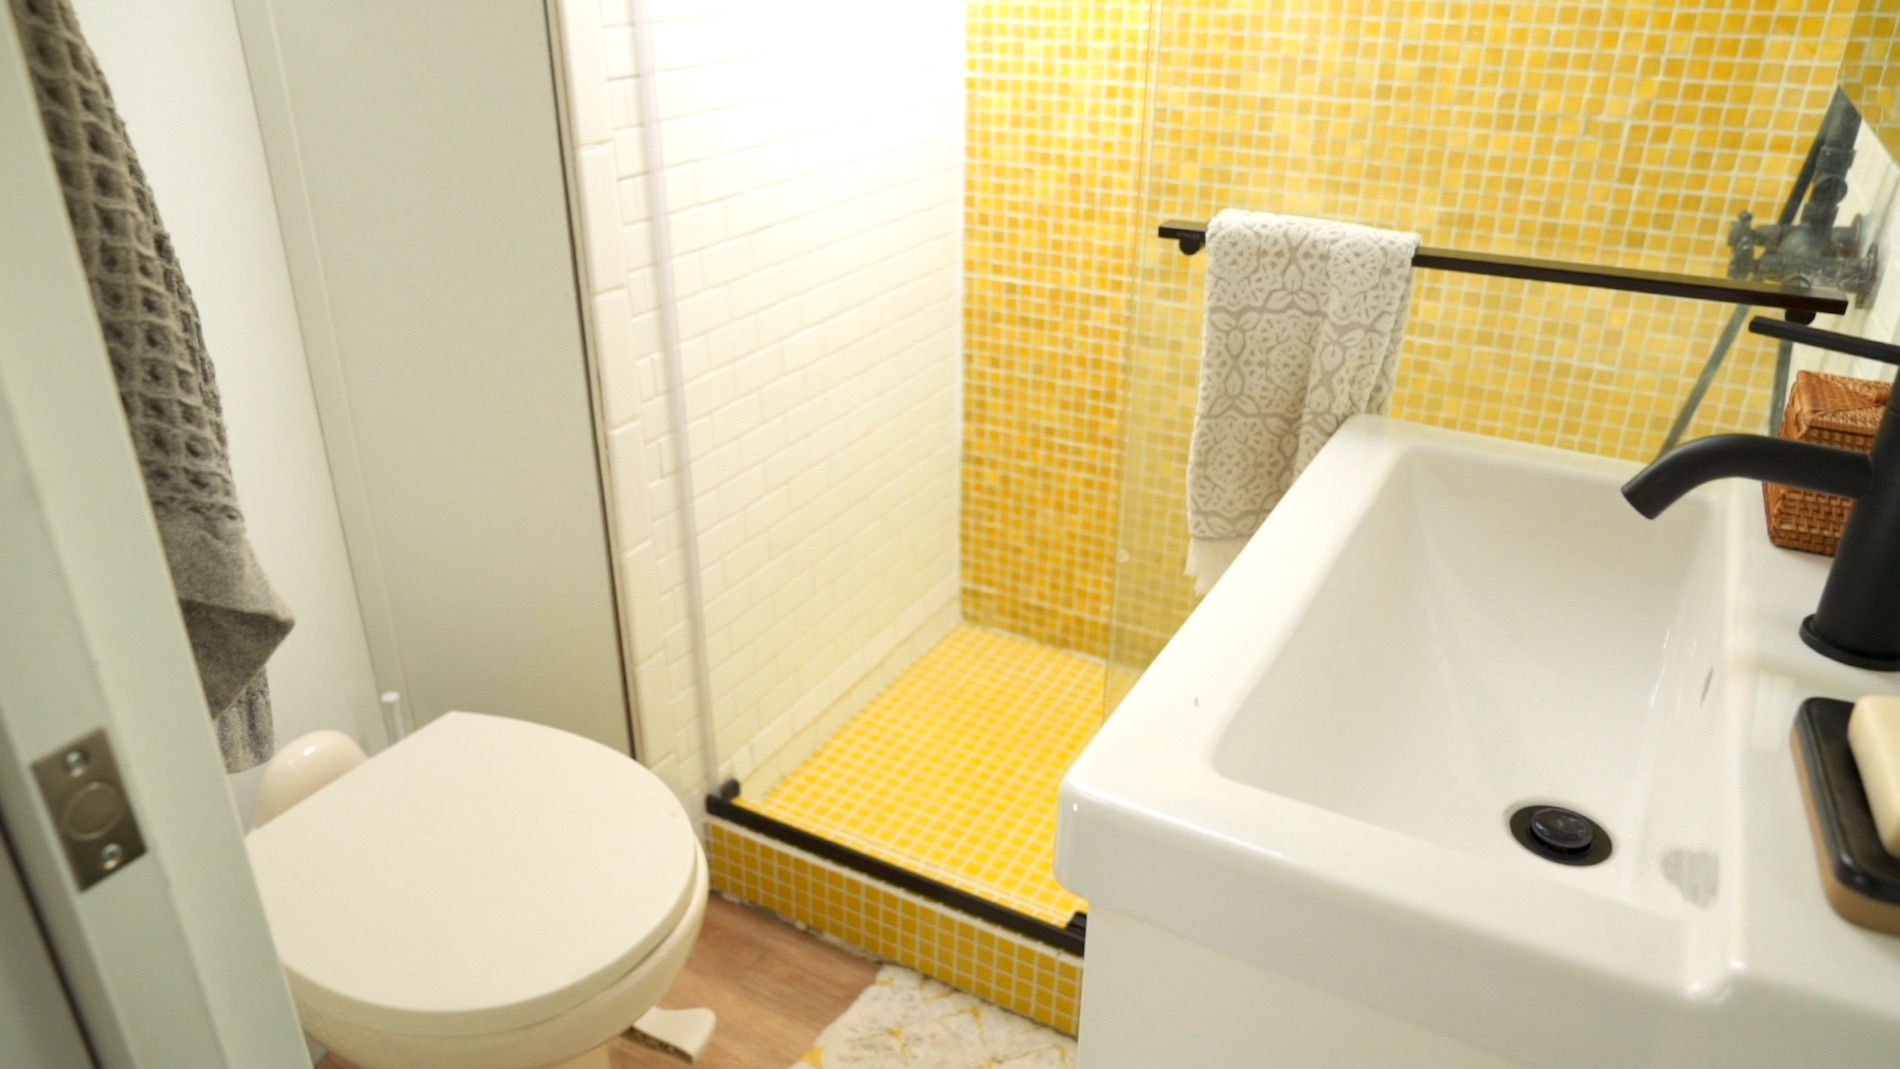 RV bathroom after